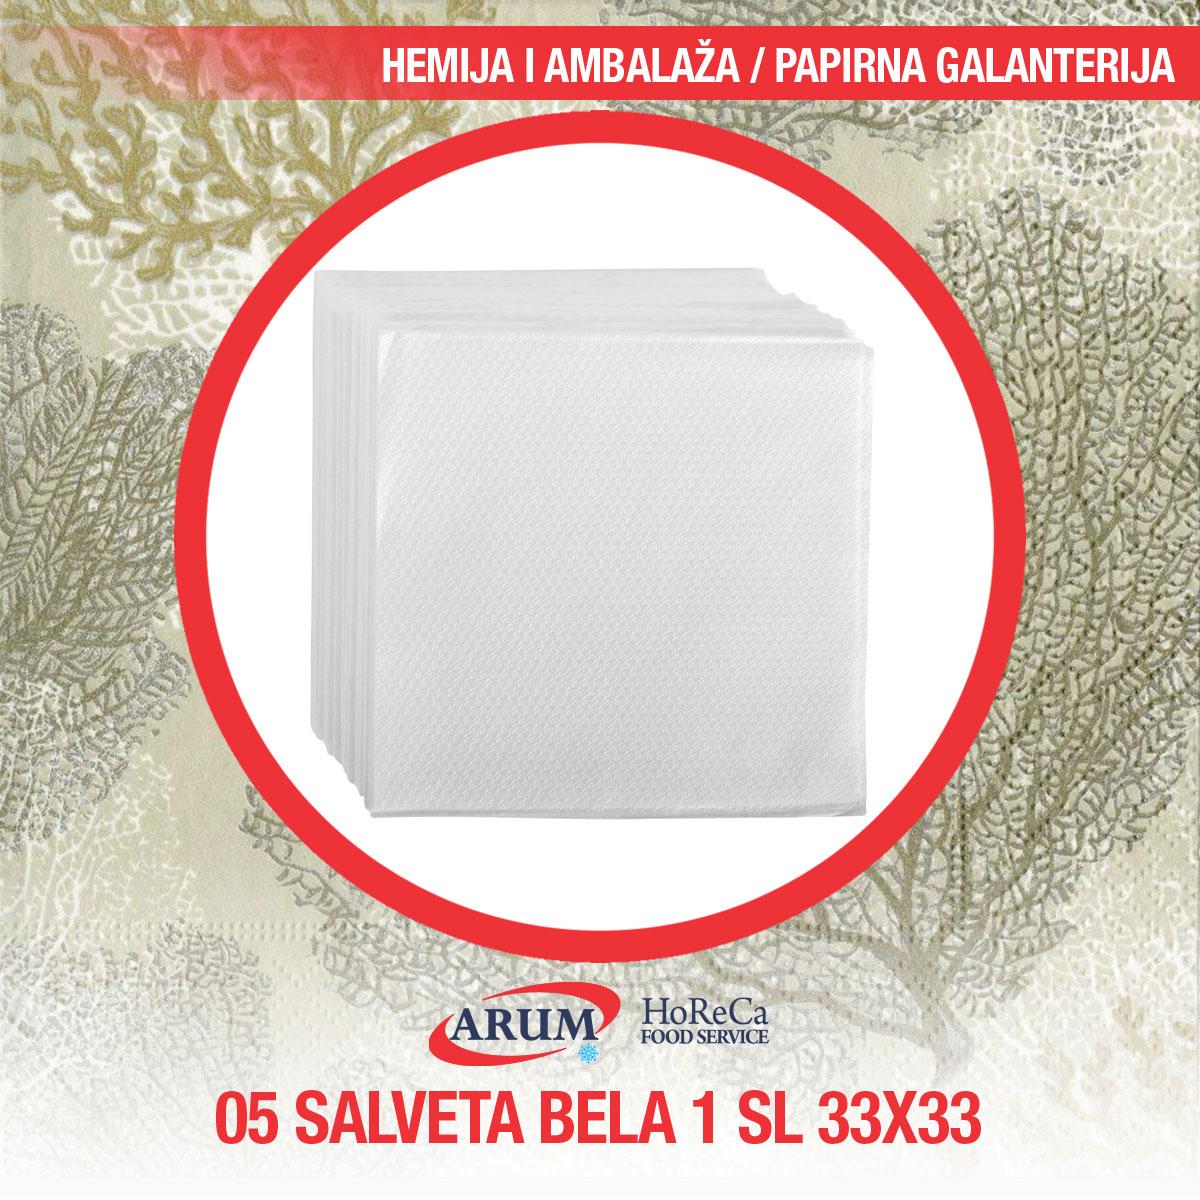 Salveta bela 1 sl 60/1 33x33